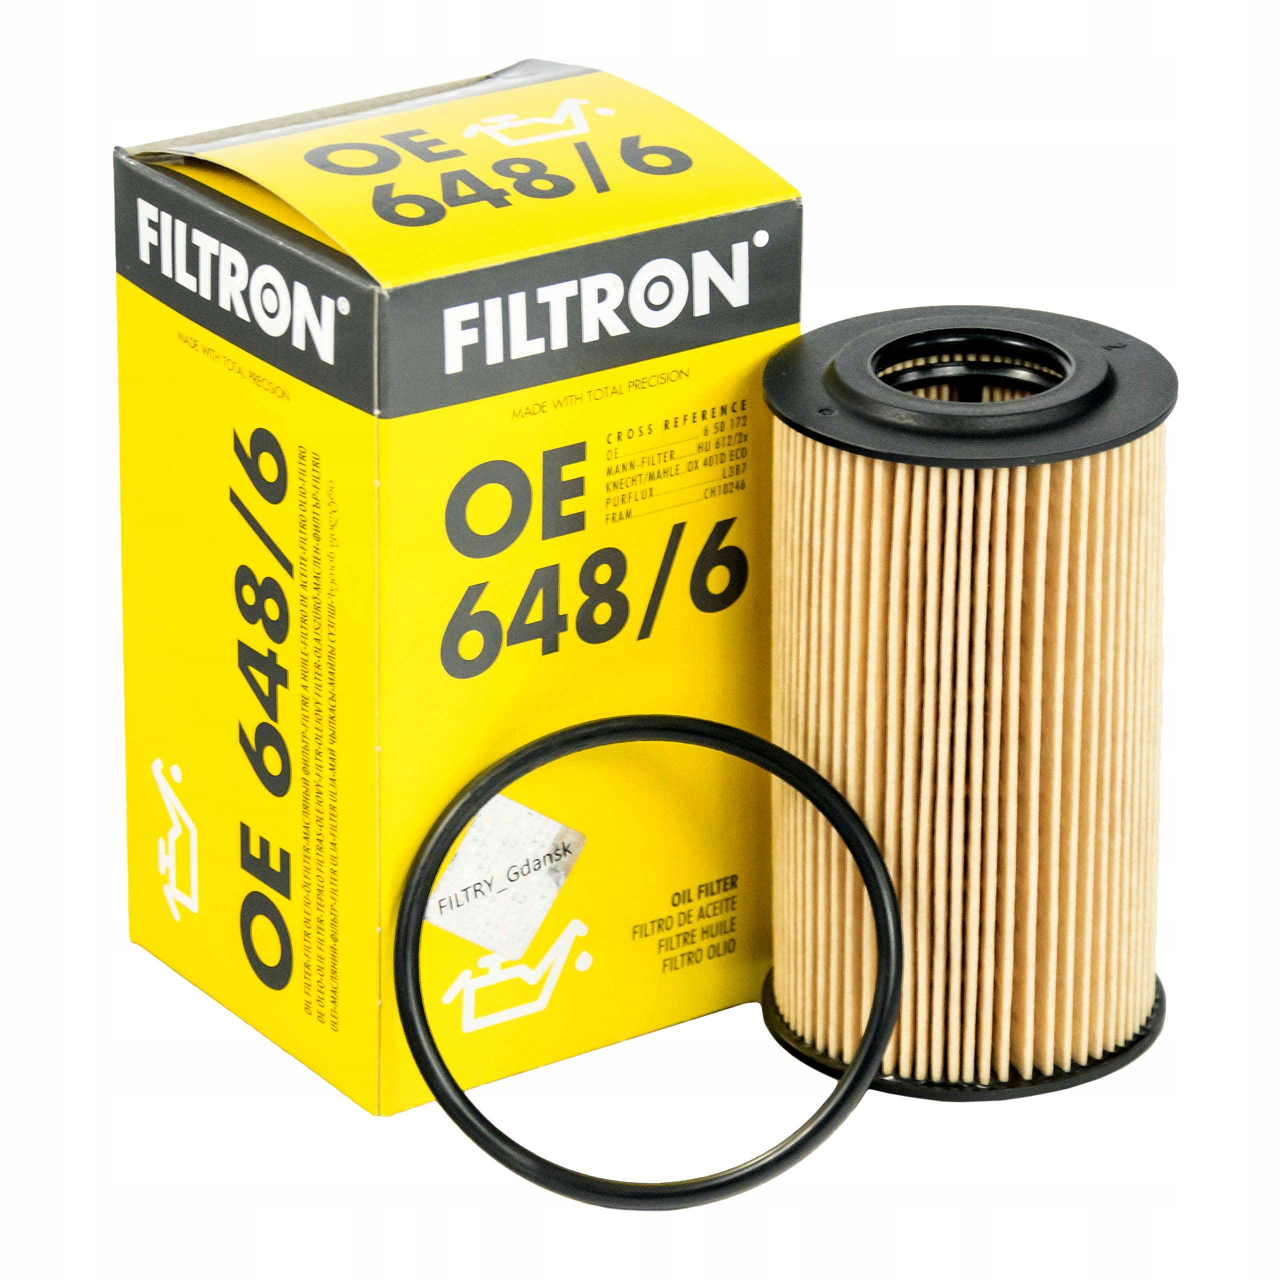 Opel Meriva B 1.4 Yağ Filtresi Filtron